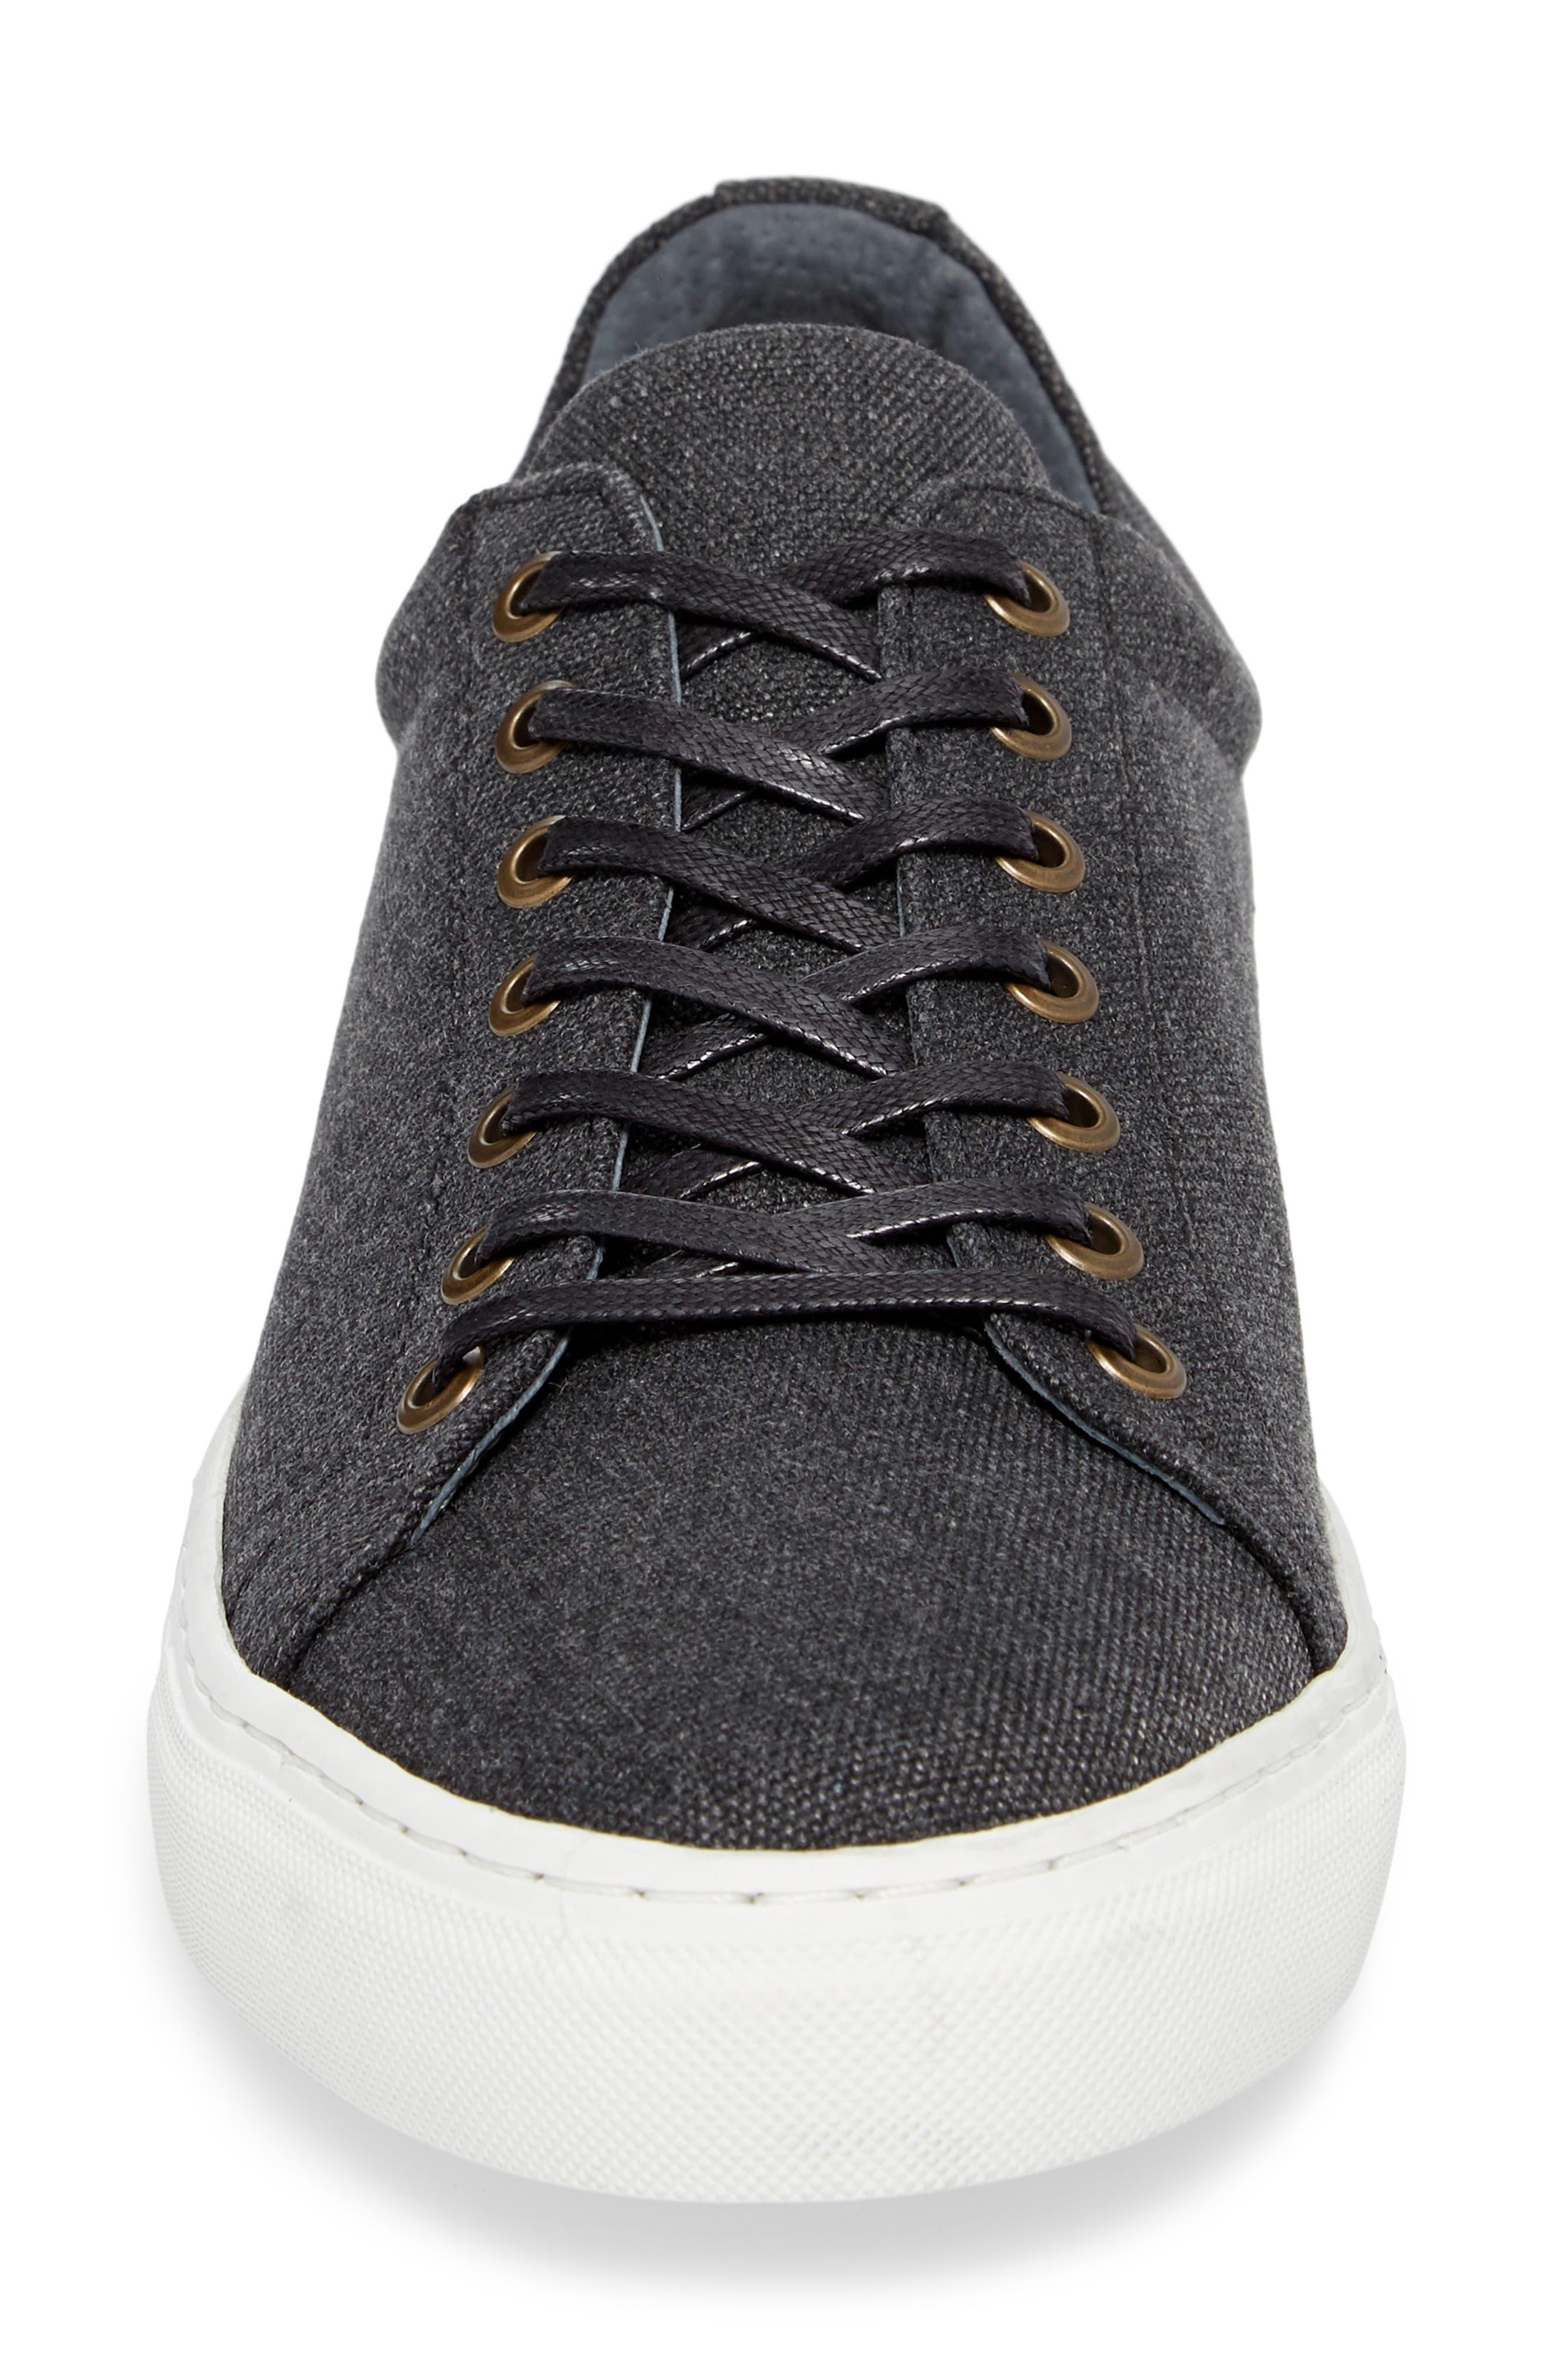 Mark Low Top Sneaker,                             Alternate thumbnail 4, color,                             007